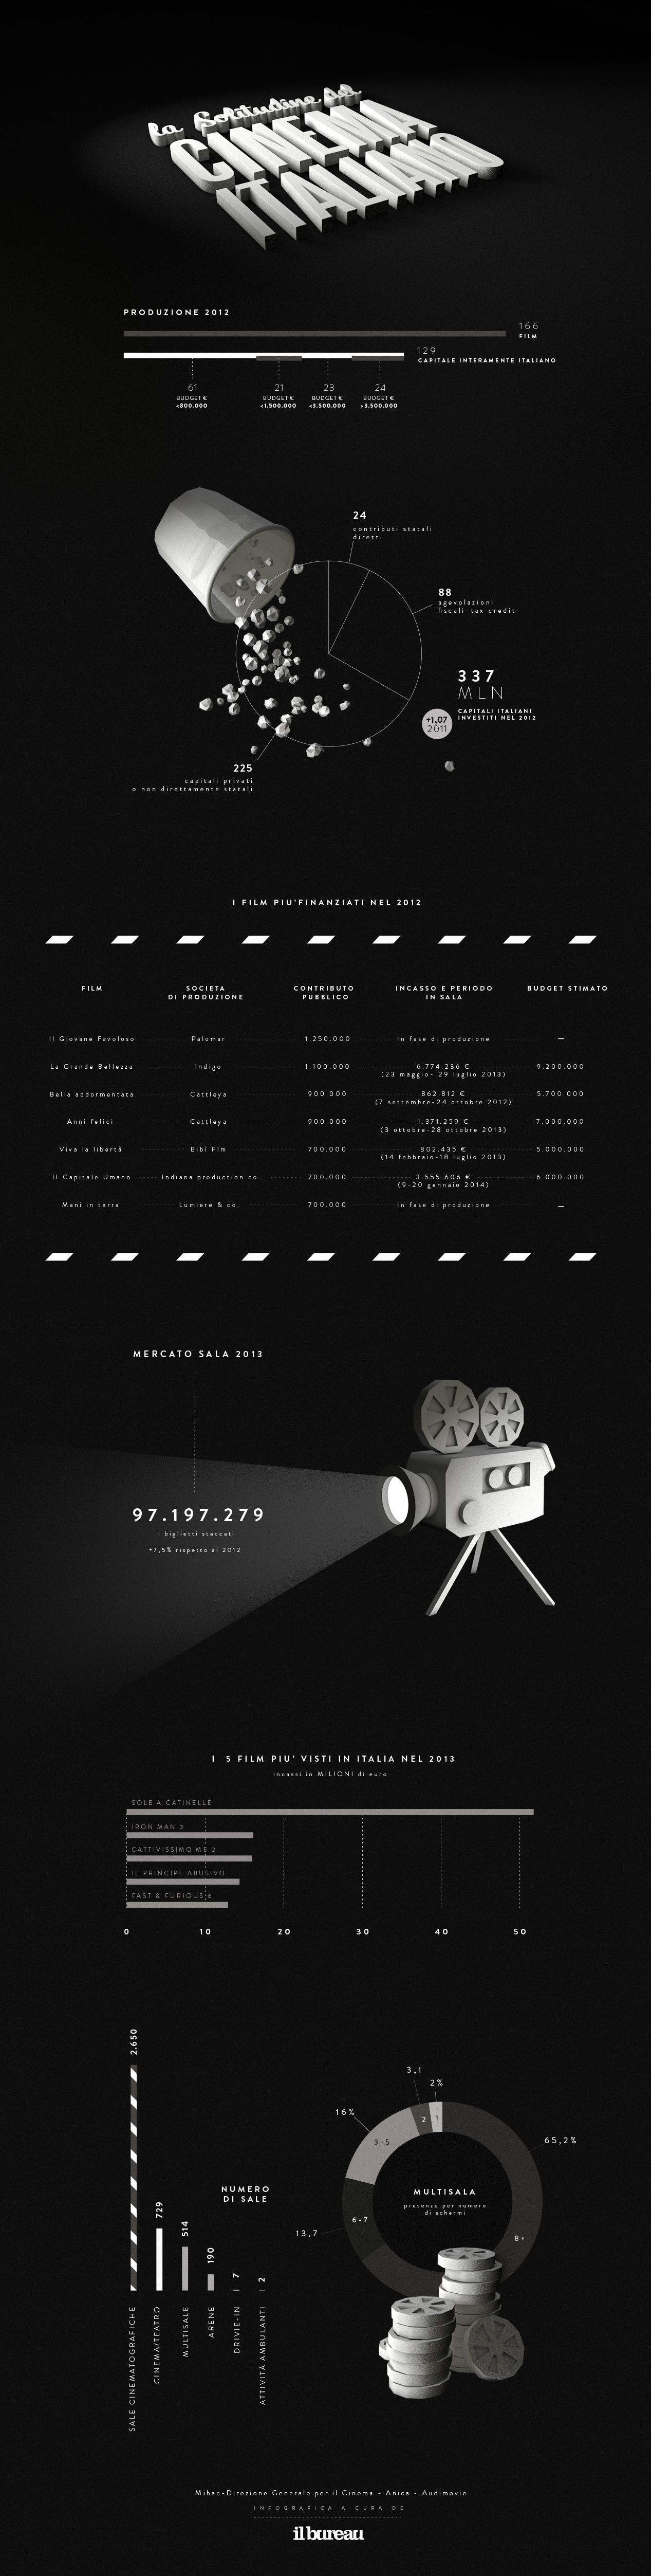 il-bureau-infografica-cinema-italiano